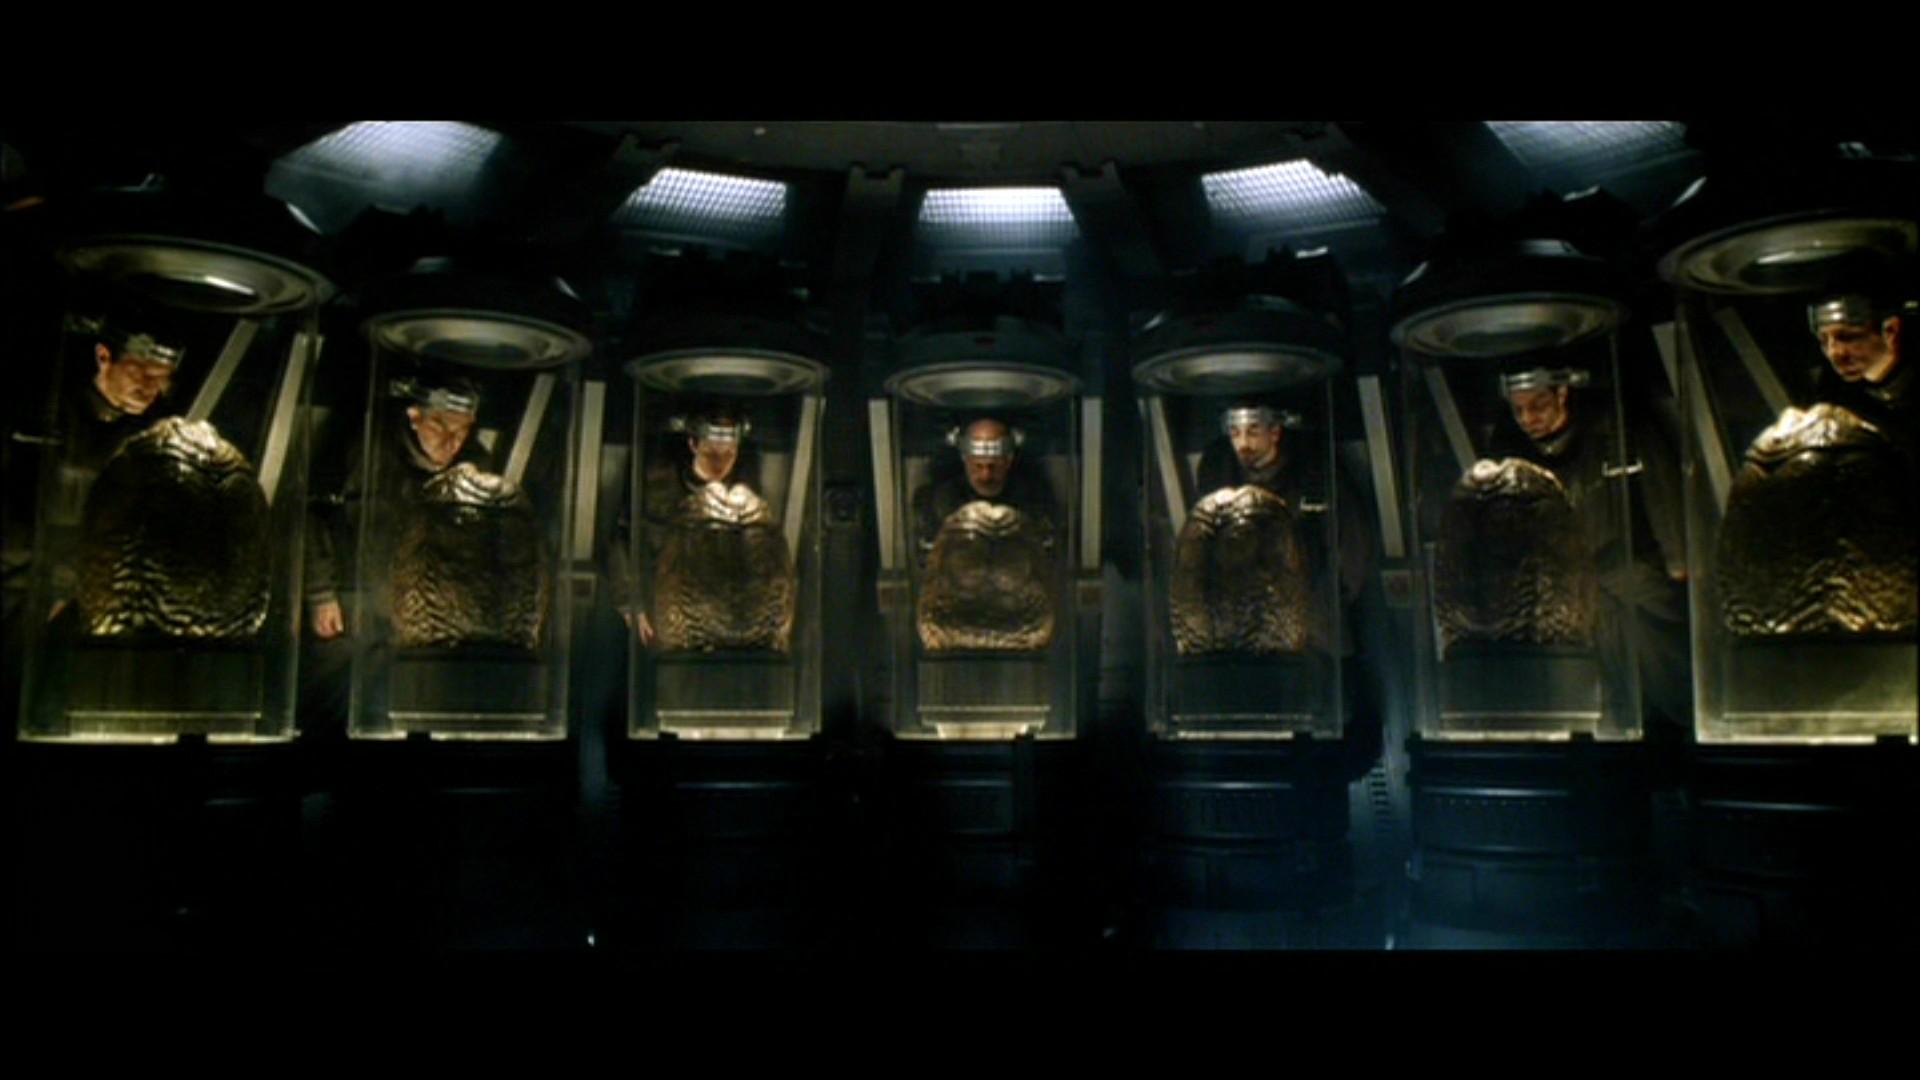 Res: 1920x1080, Movie - Alien: Resurrection Wallpaper